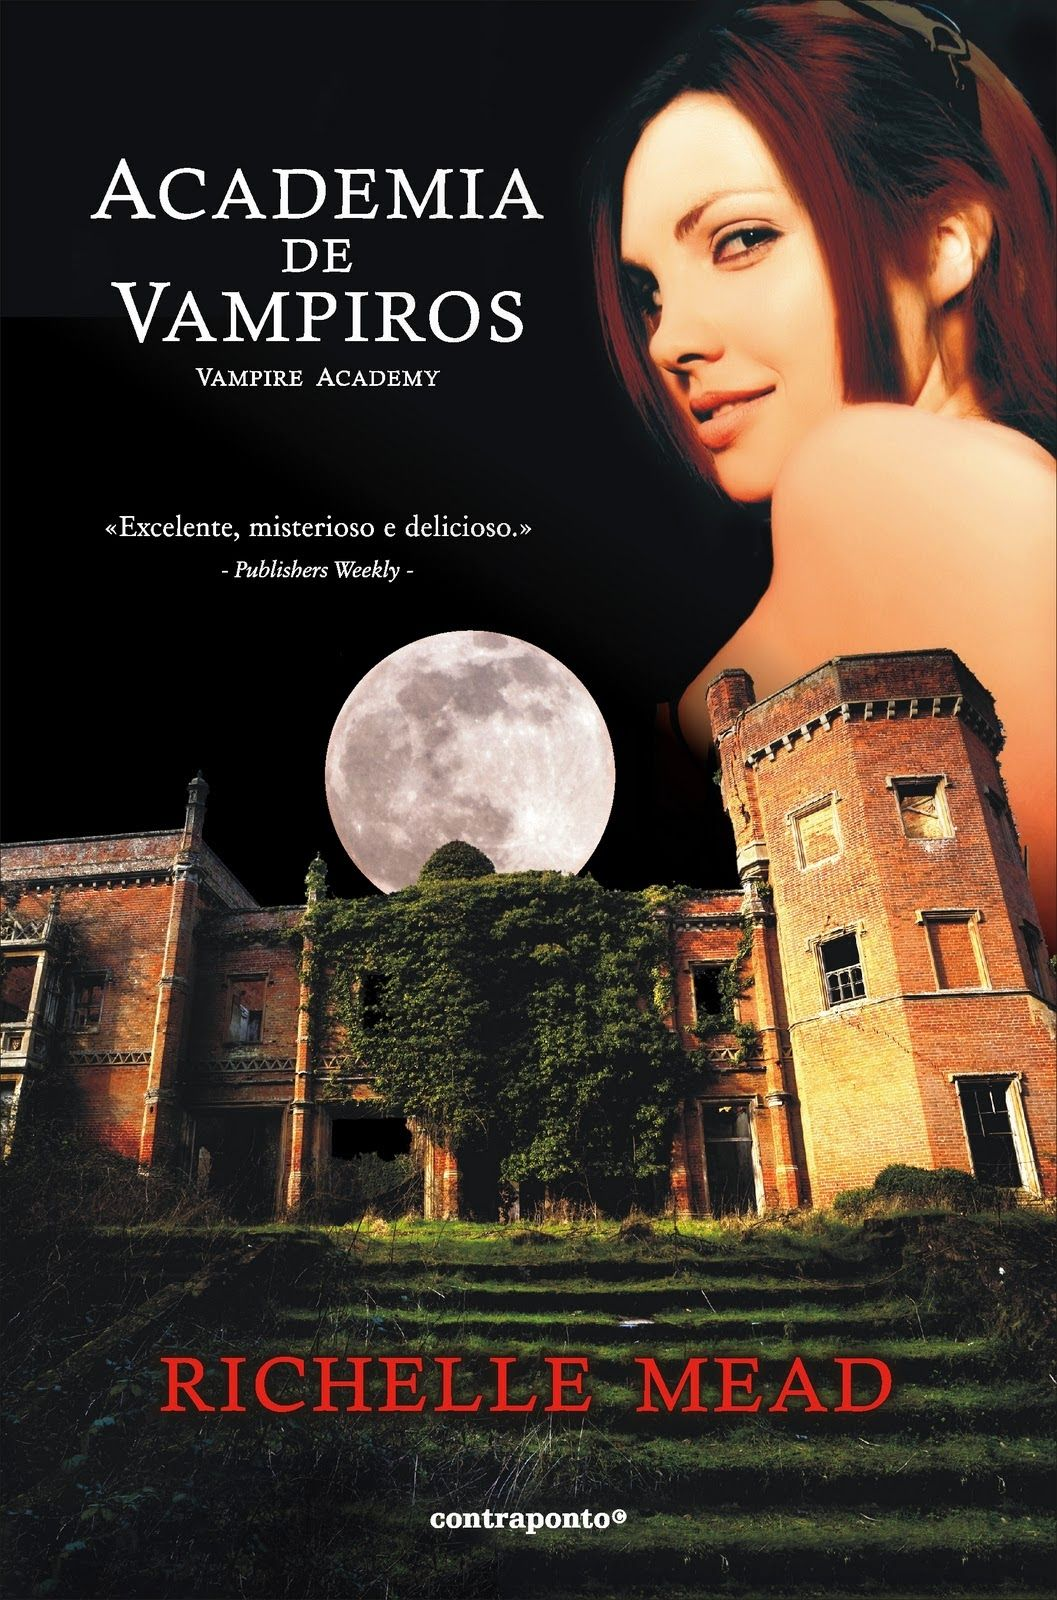 Assistir Academia De Vampiros O Beijo Das Sombras Dublado 2014 Online Cantinho Da Cultura Academia De Vampiros Vampiros Vampire Academy